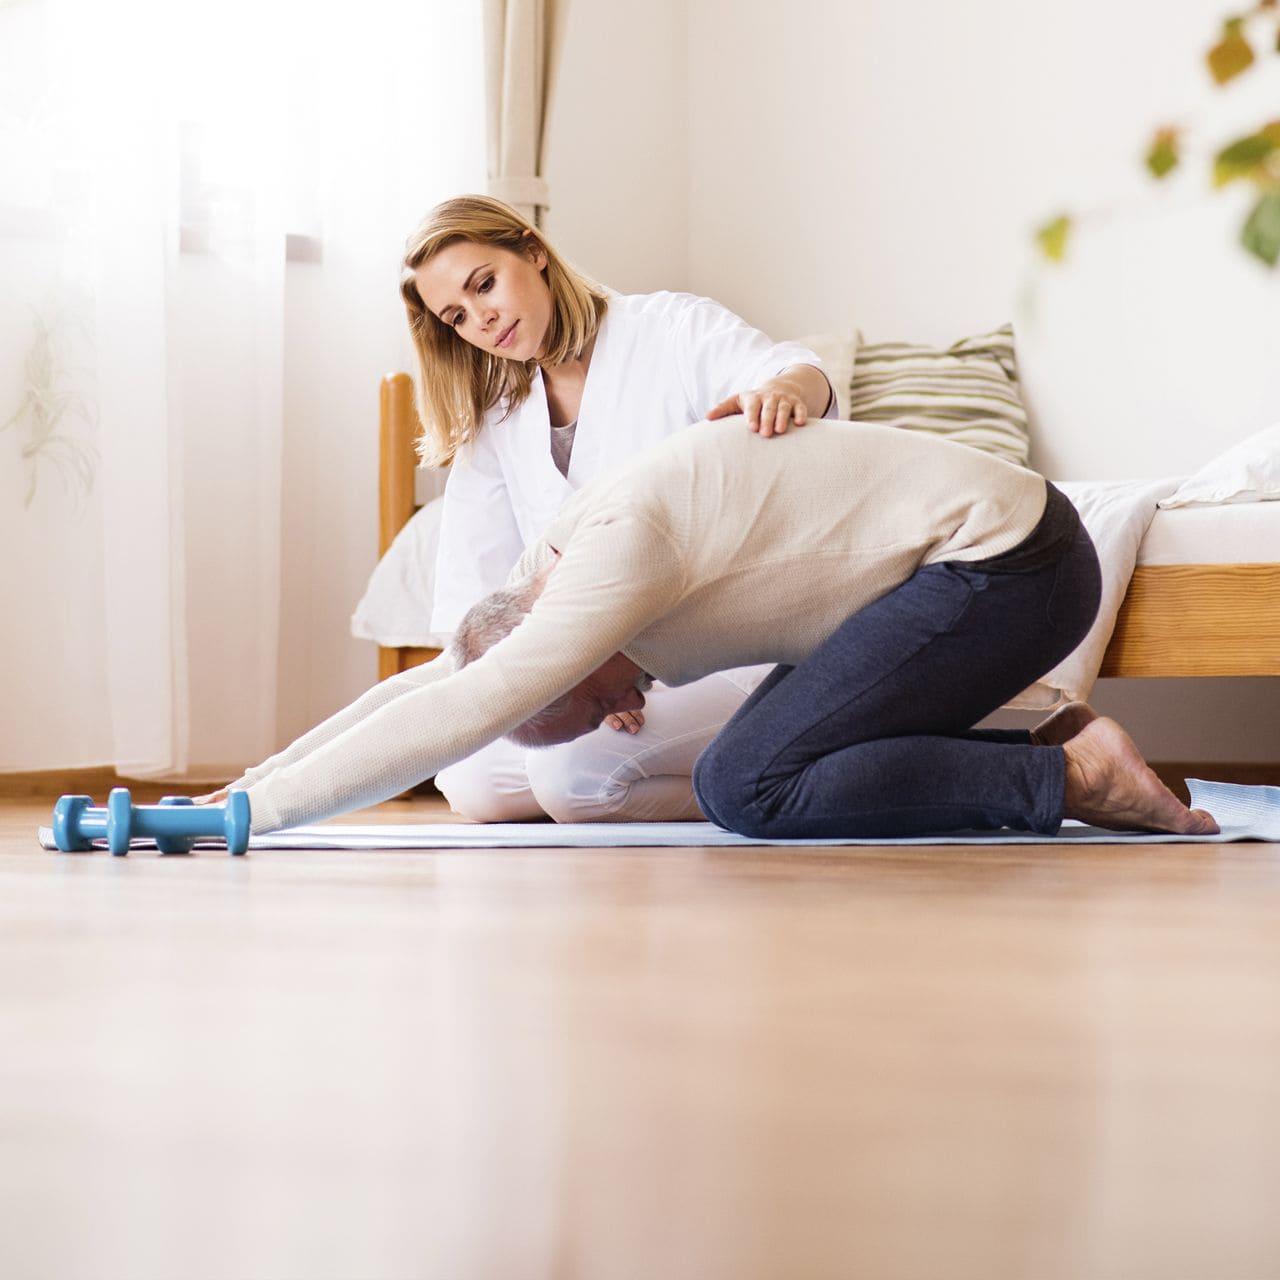 fisioterapia a domicilio sacroilitis